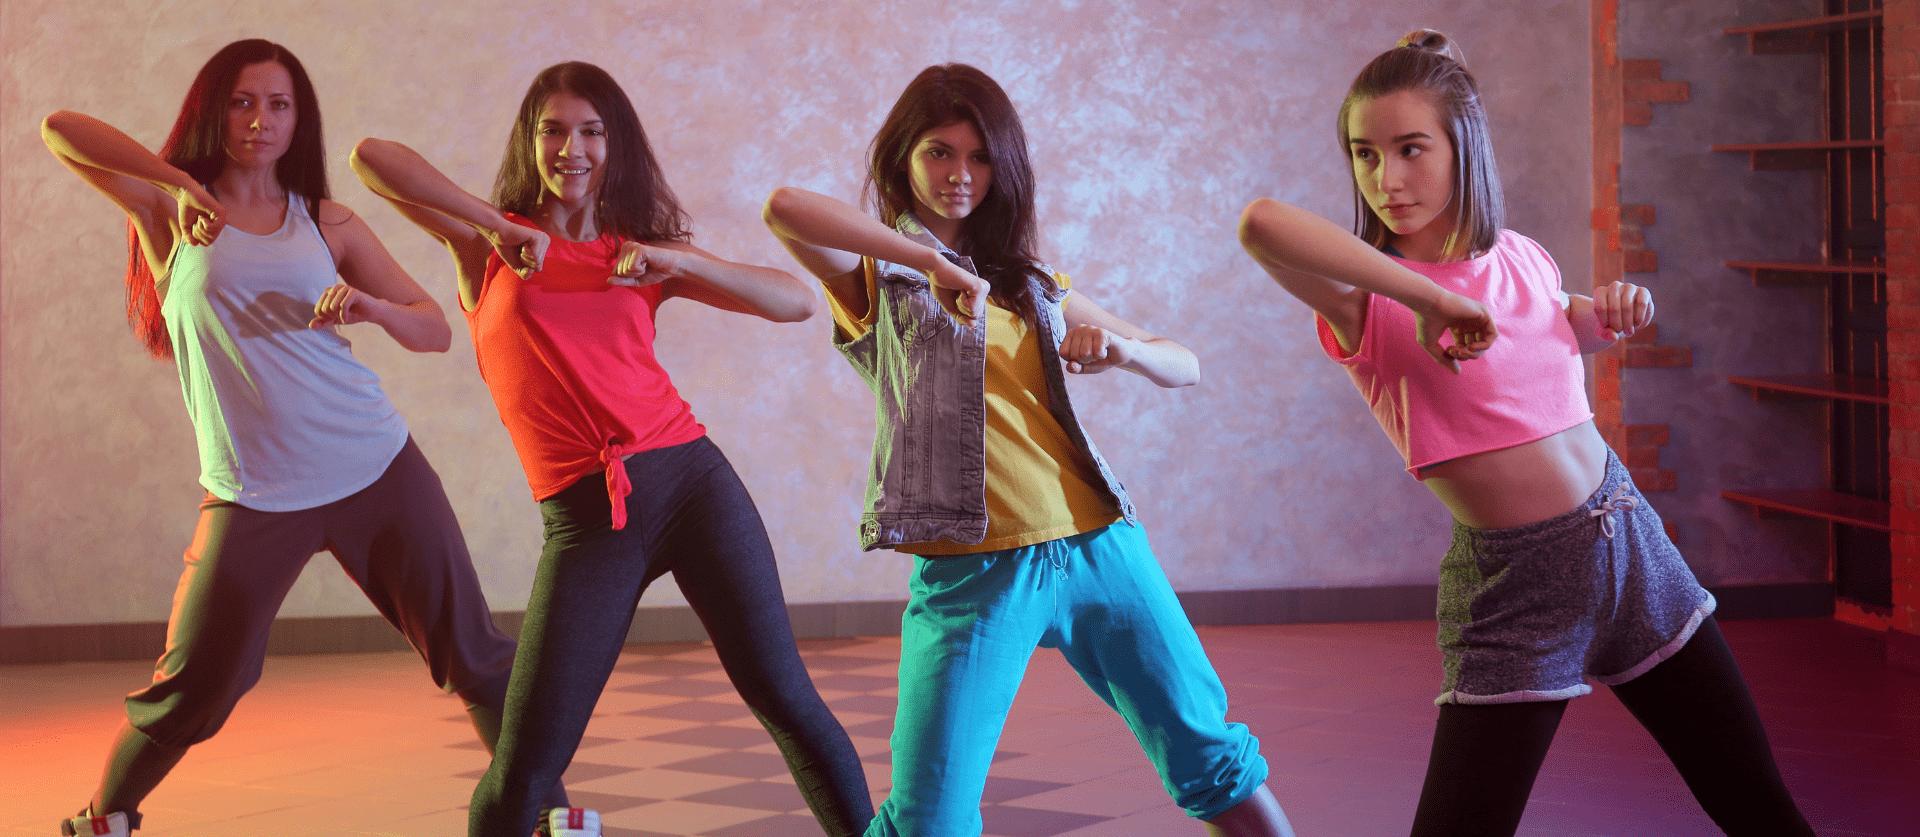 dance-school-management-software